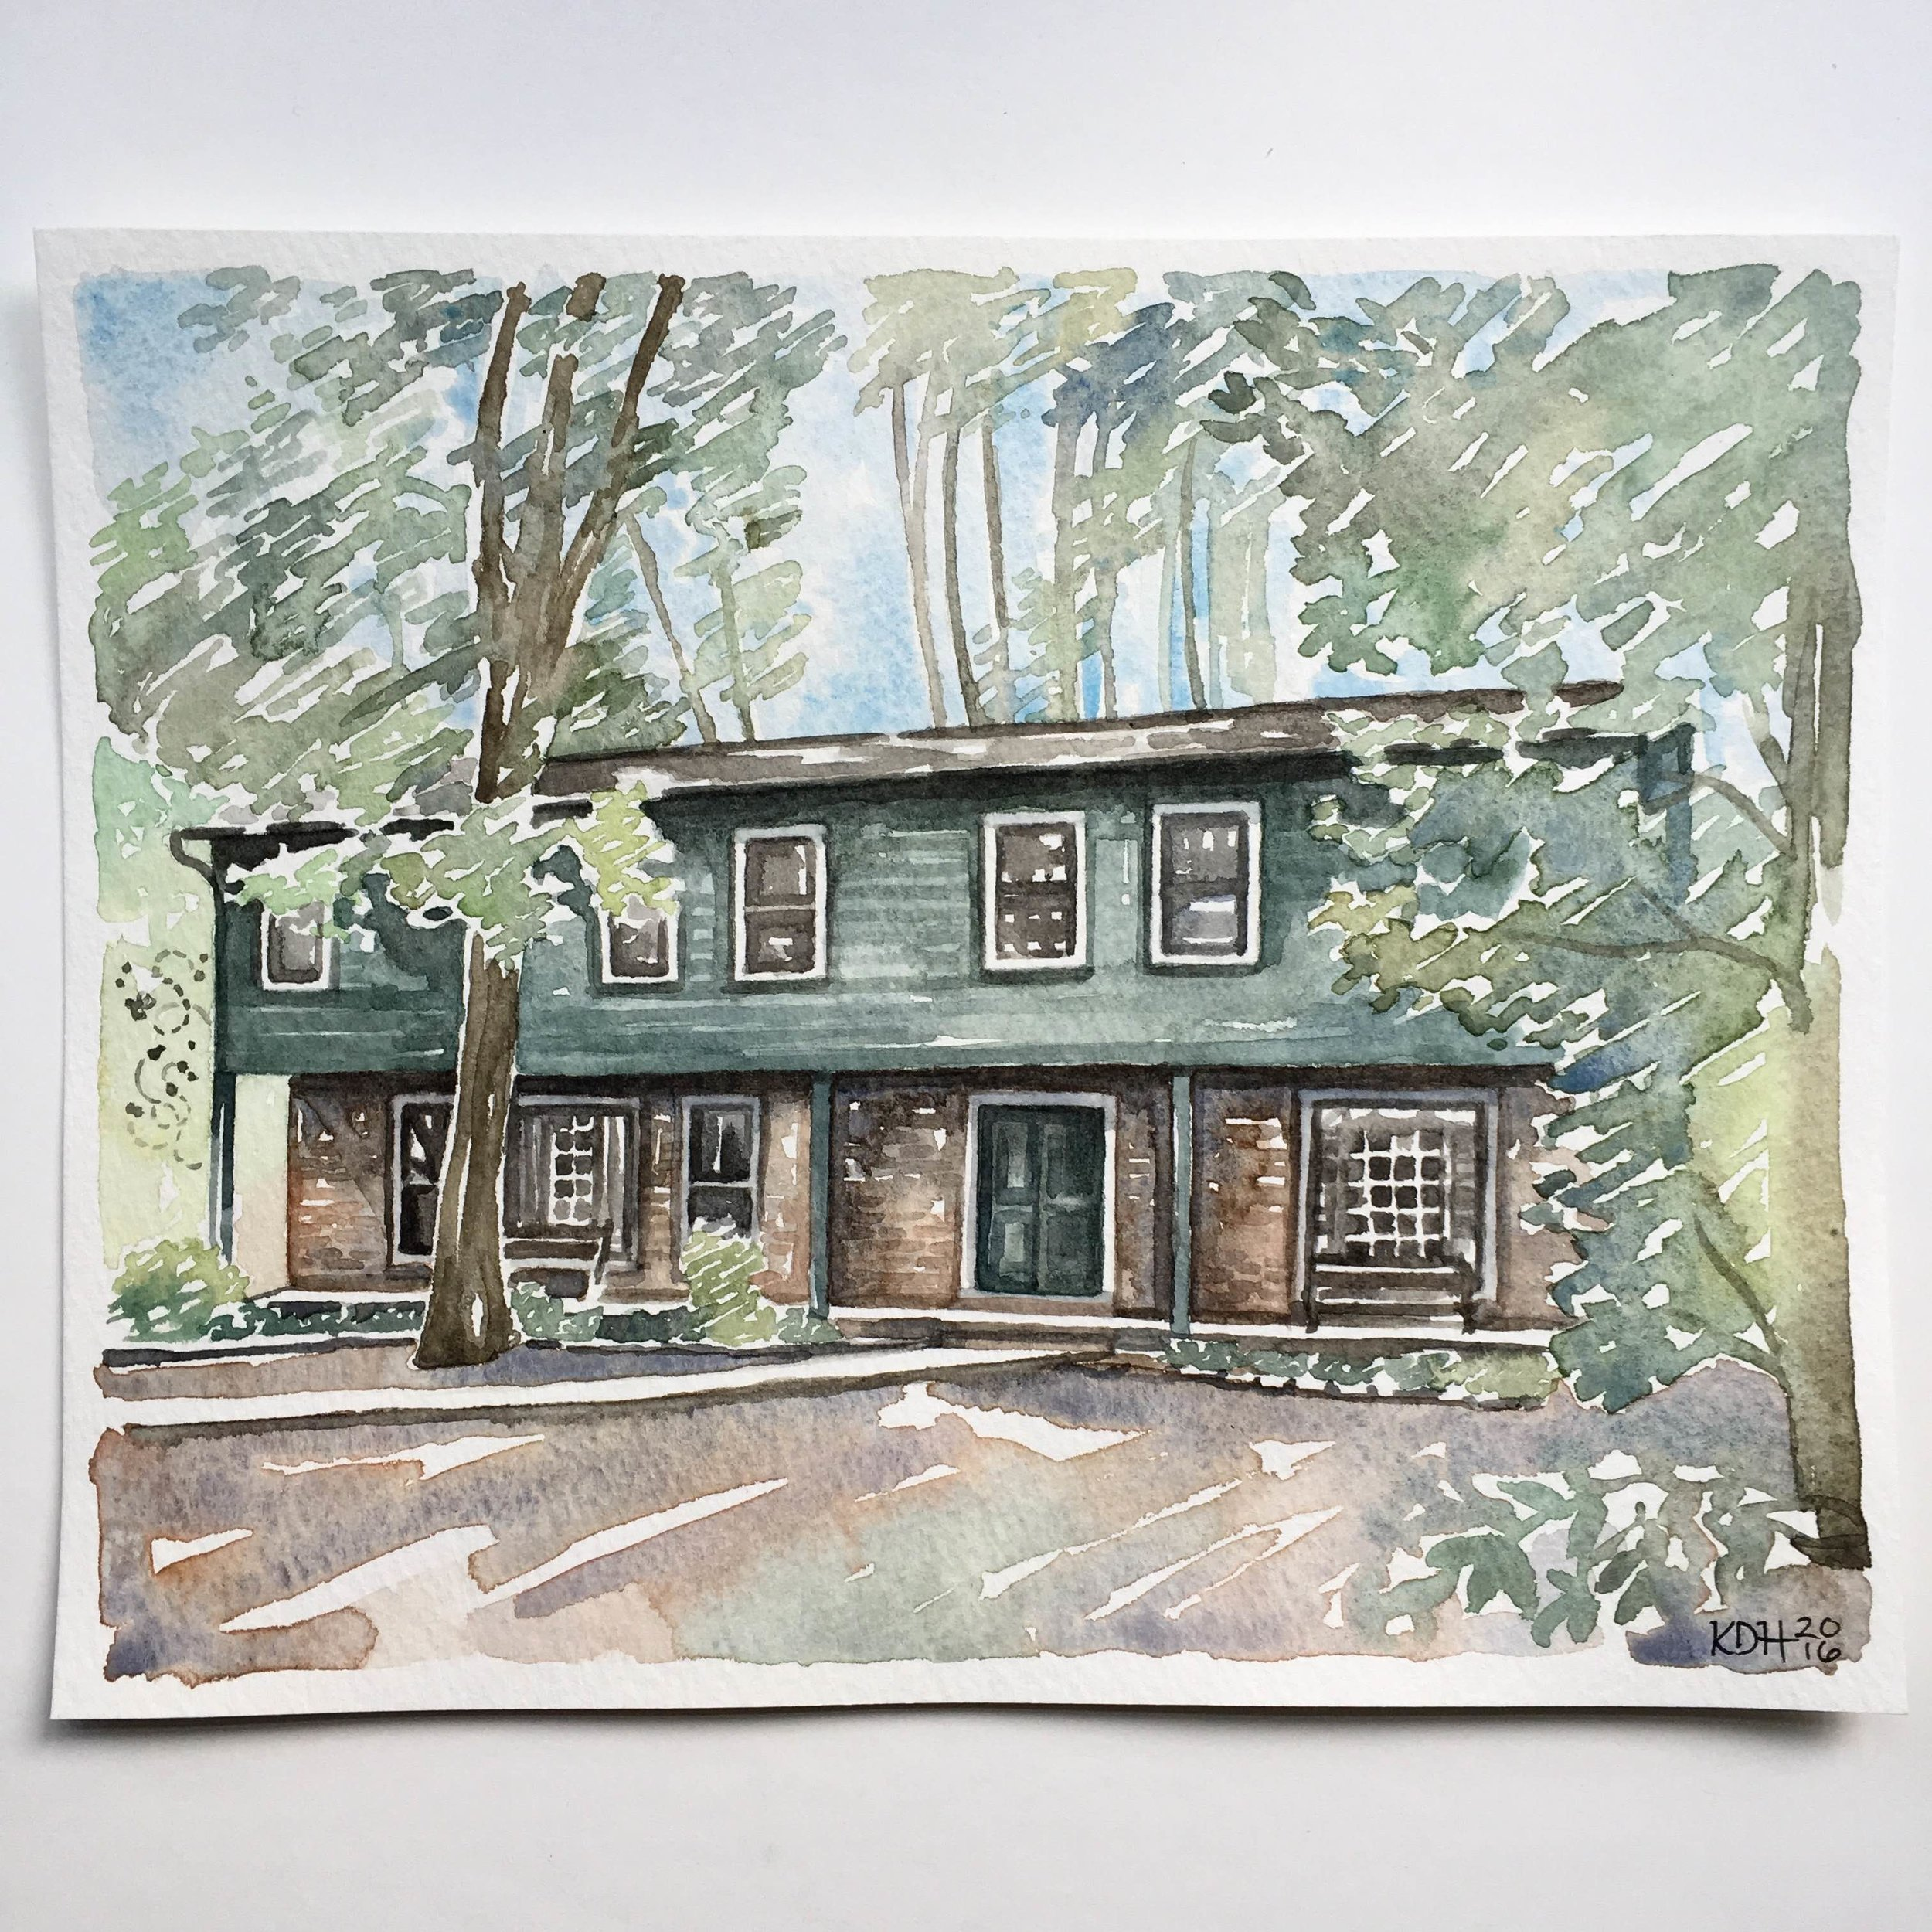 Birmingham Home [8x10]